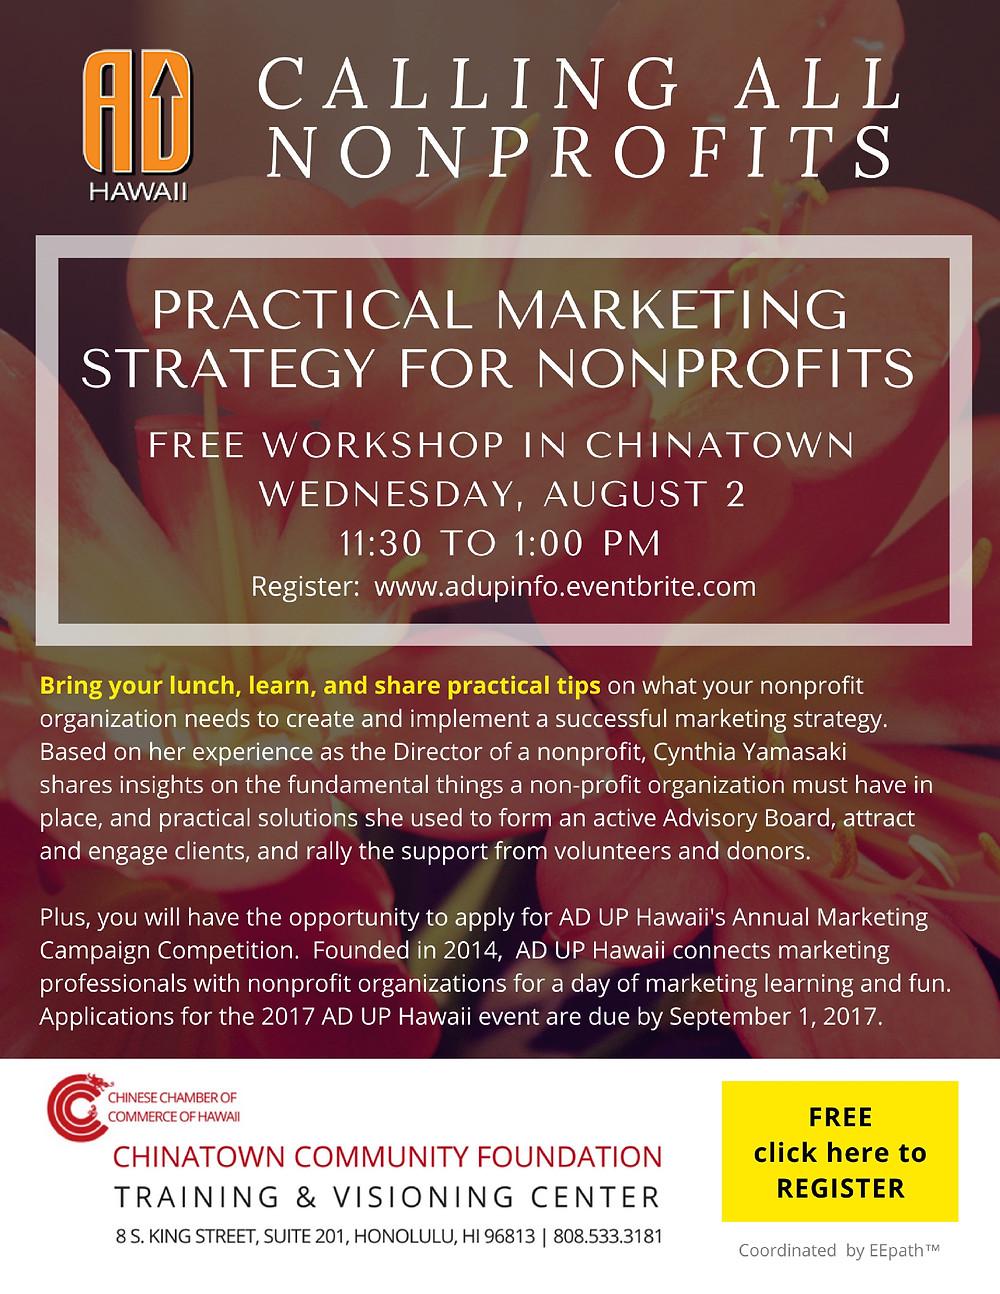 Ad Up Information Workshop on August 2